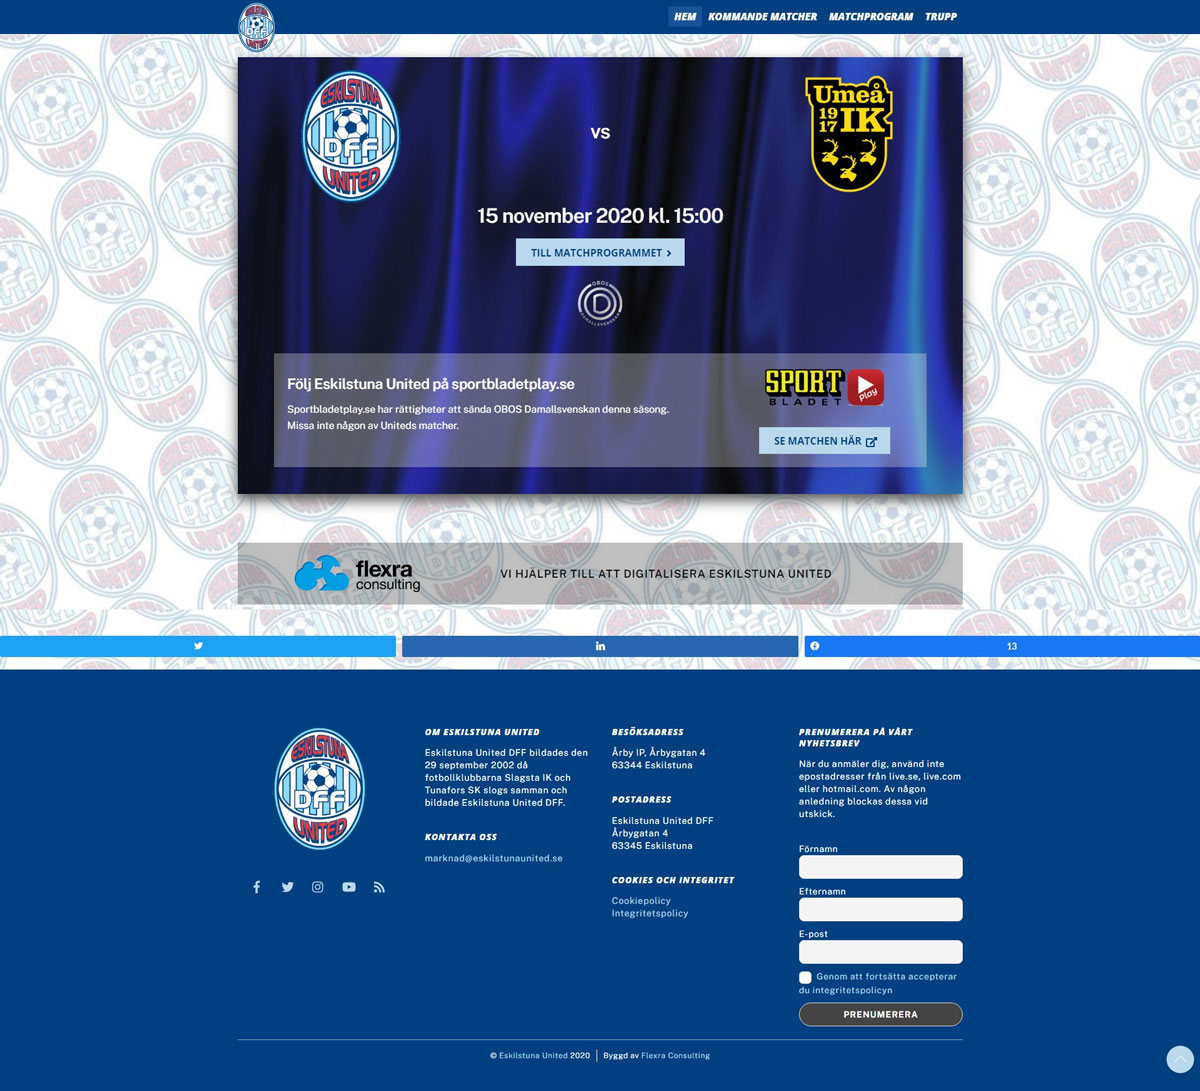 Eskilstuna United Matchprogram front